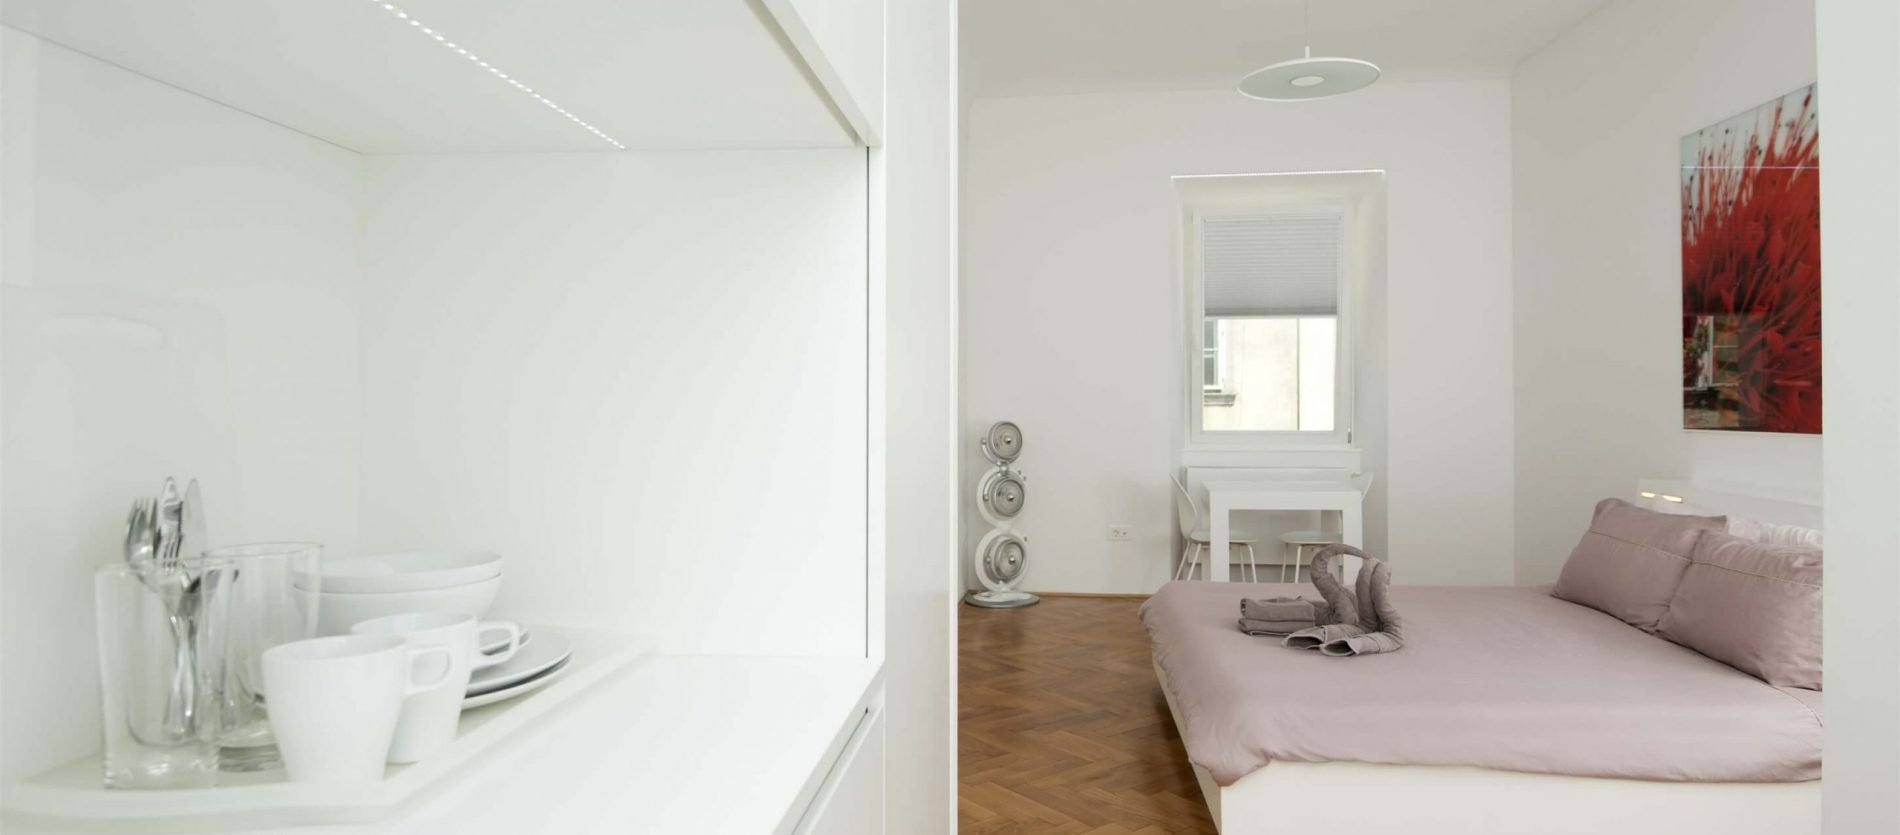 Double Room - Galeria River